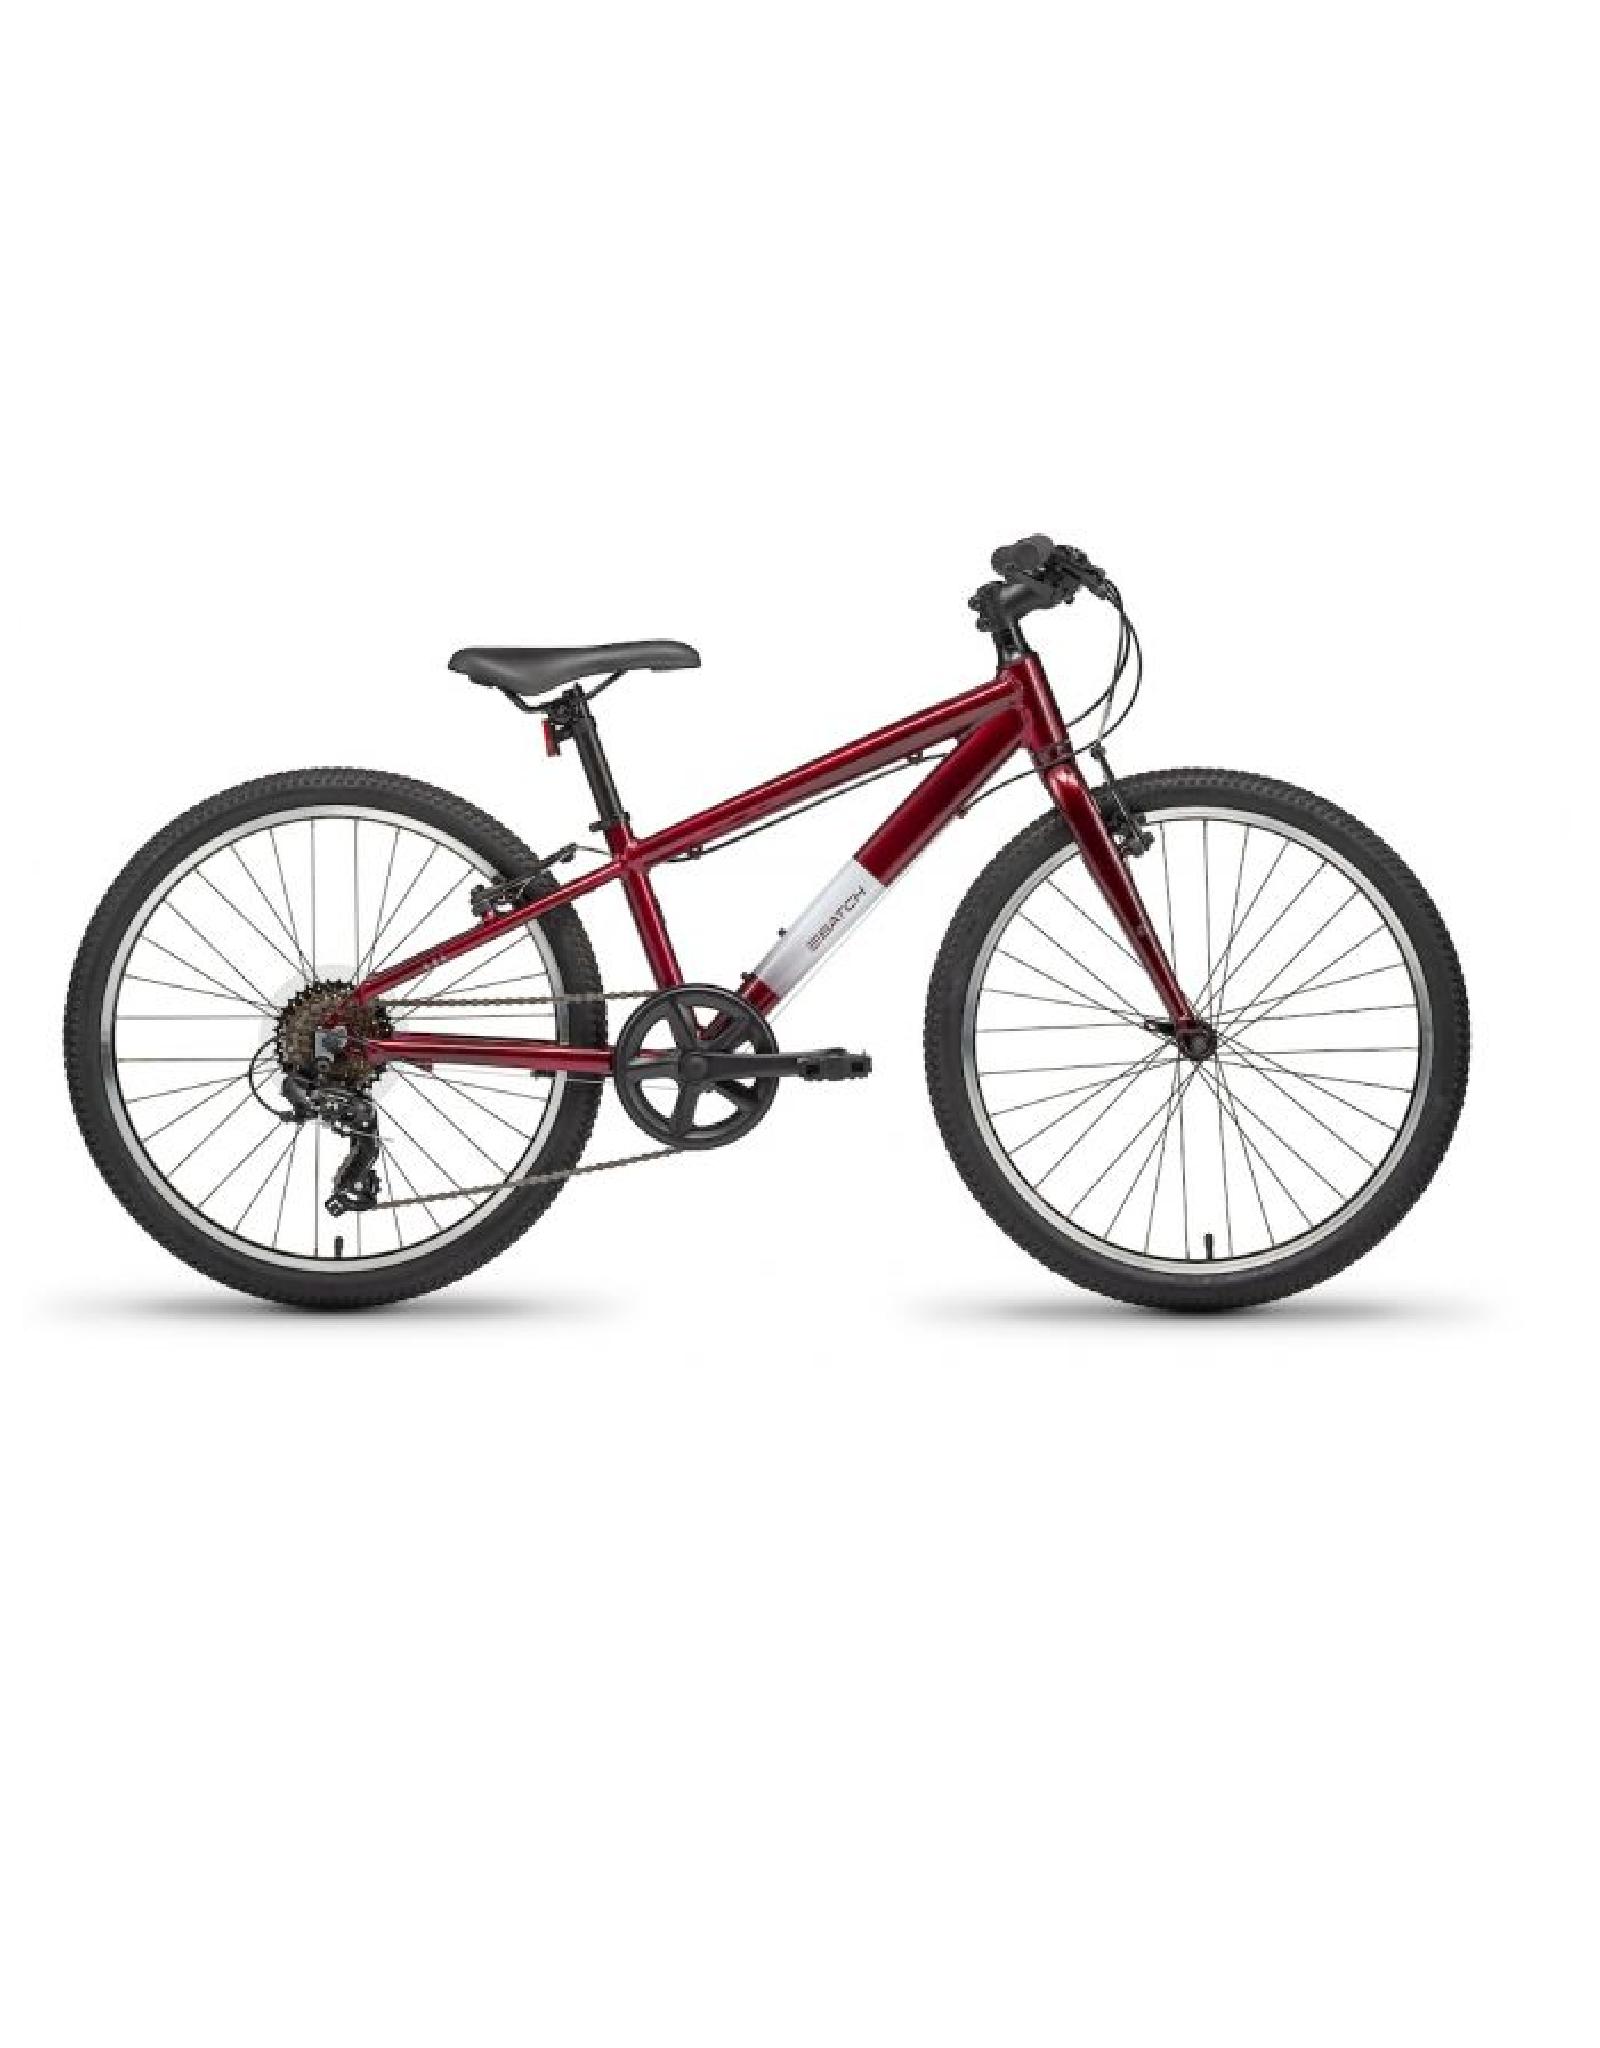 "Batch Batch 24"" Lifestyle Complete Bike"